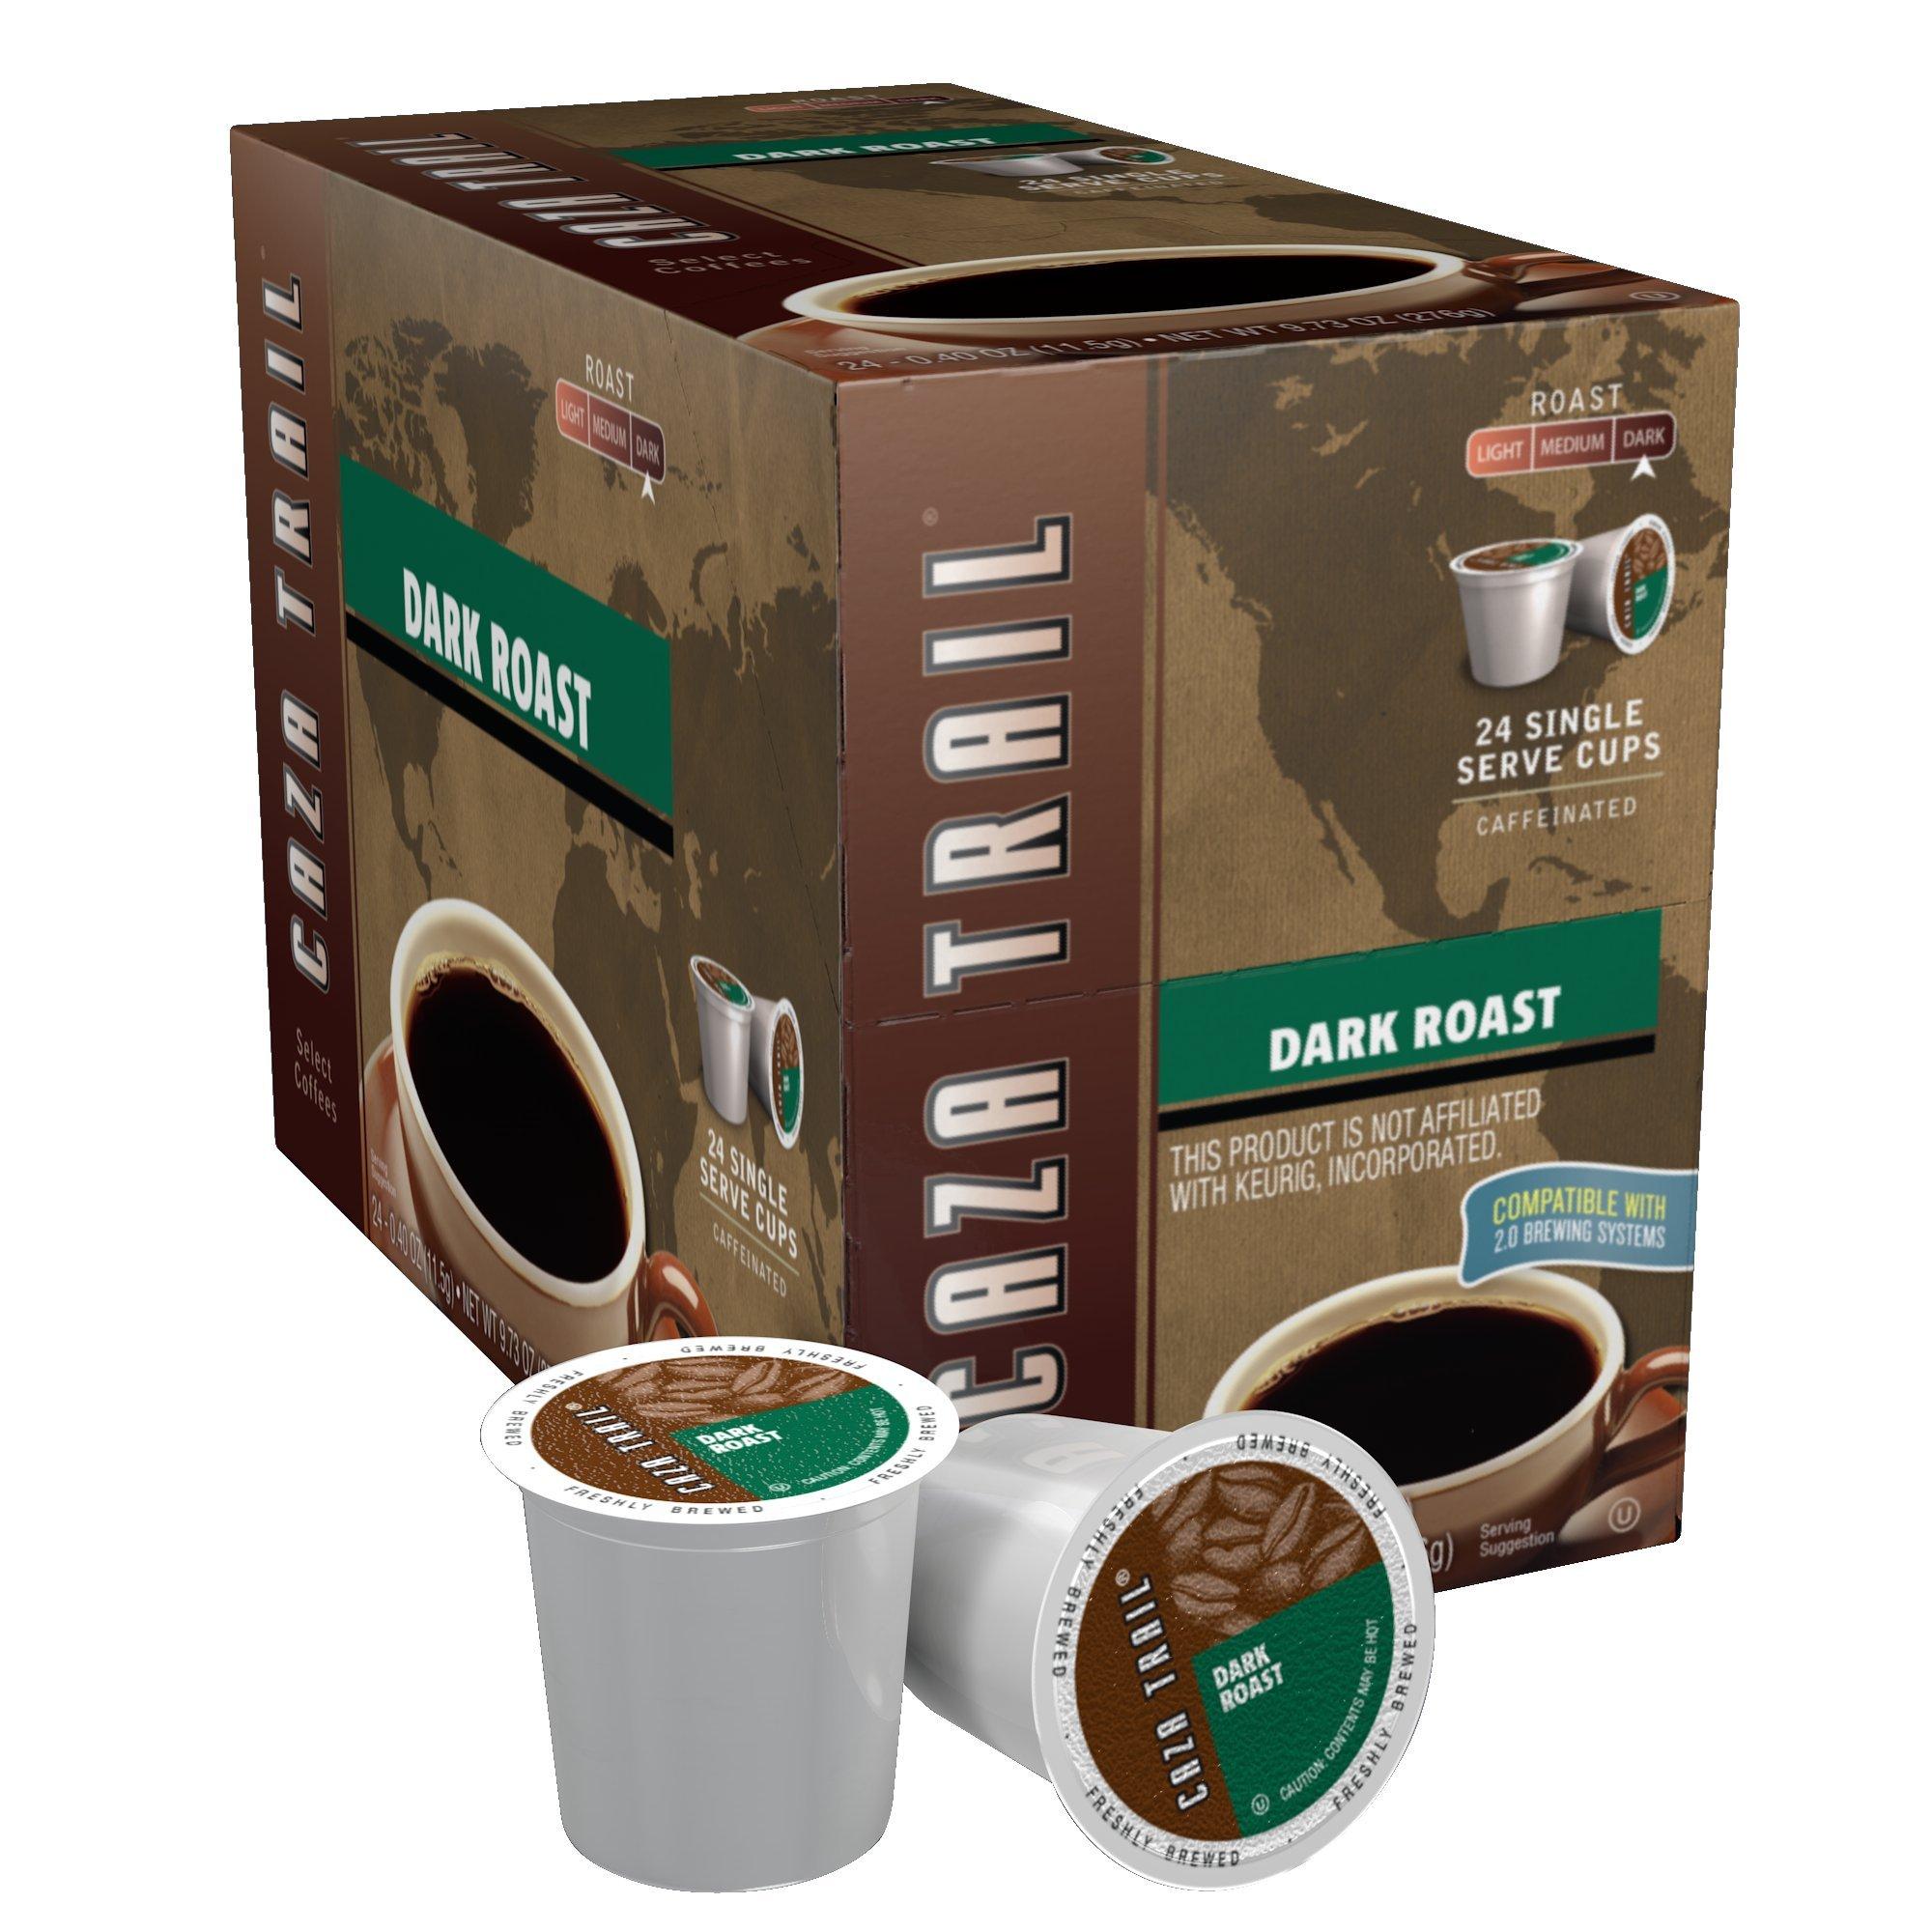 Caza Trail Coffee, Dark Roast, 24 Single Serve Cups